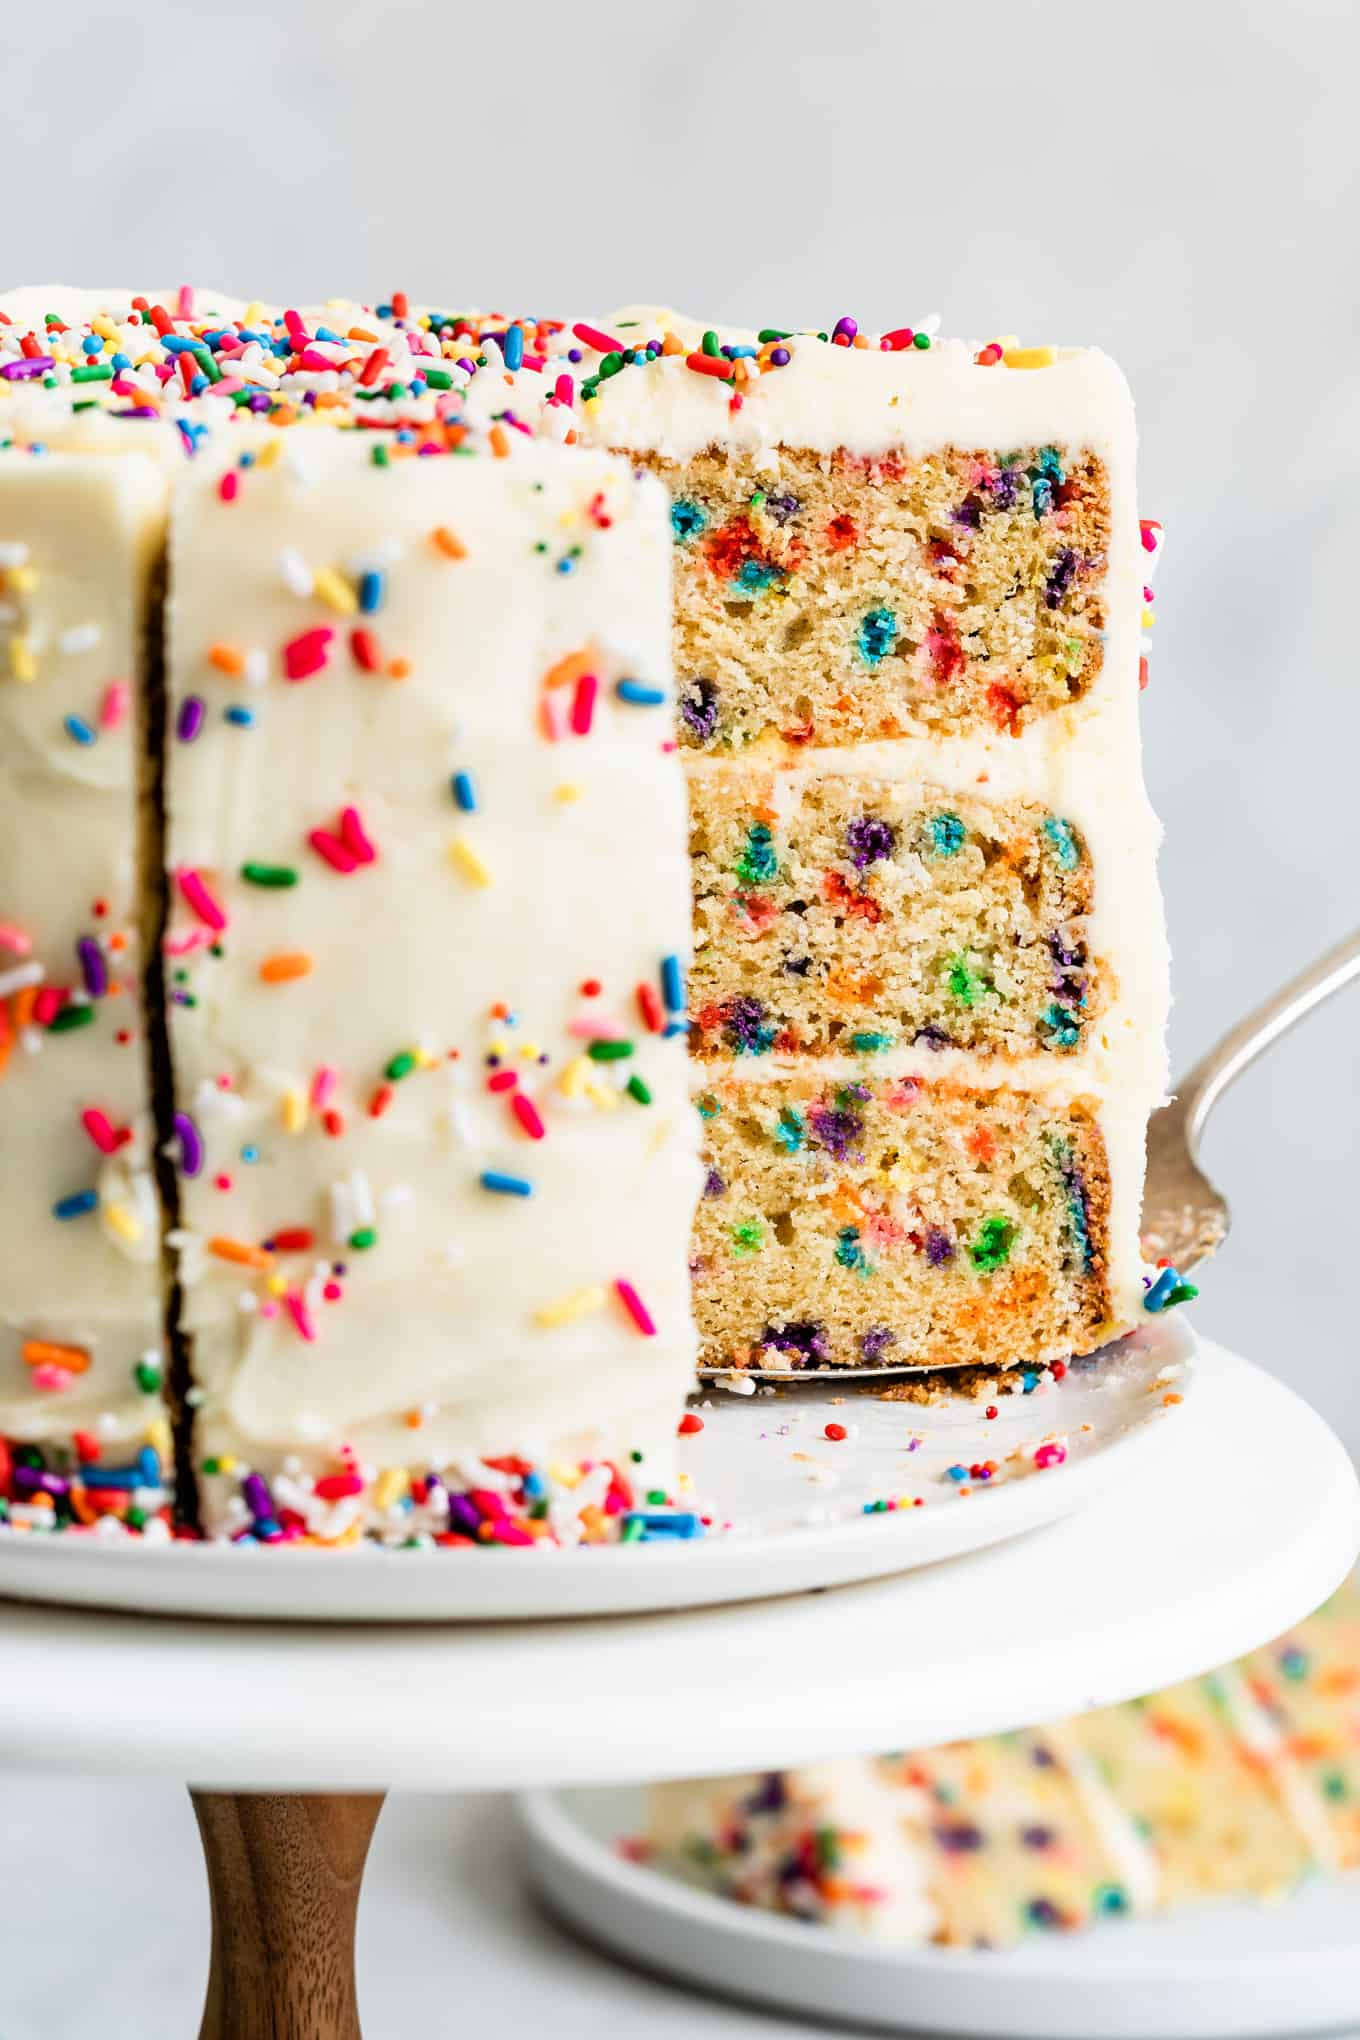 Sliced Gluten-Free Funfetti Cake